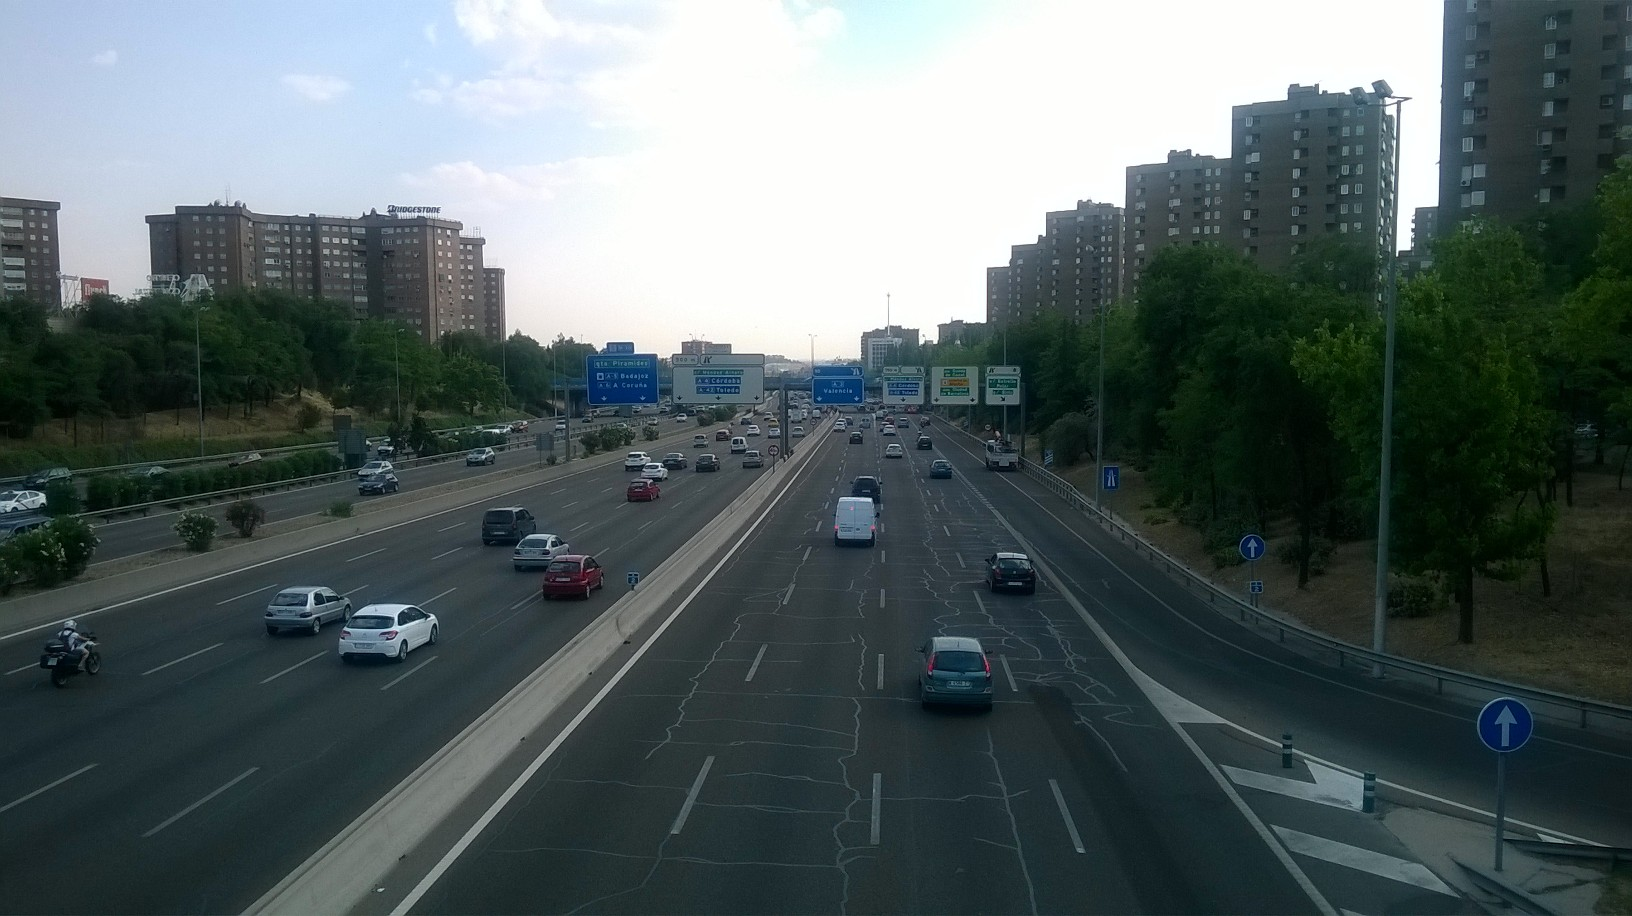 madrid M30 passarelle out city valencia on A3 aug16